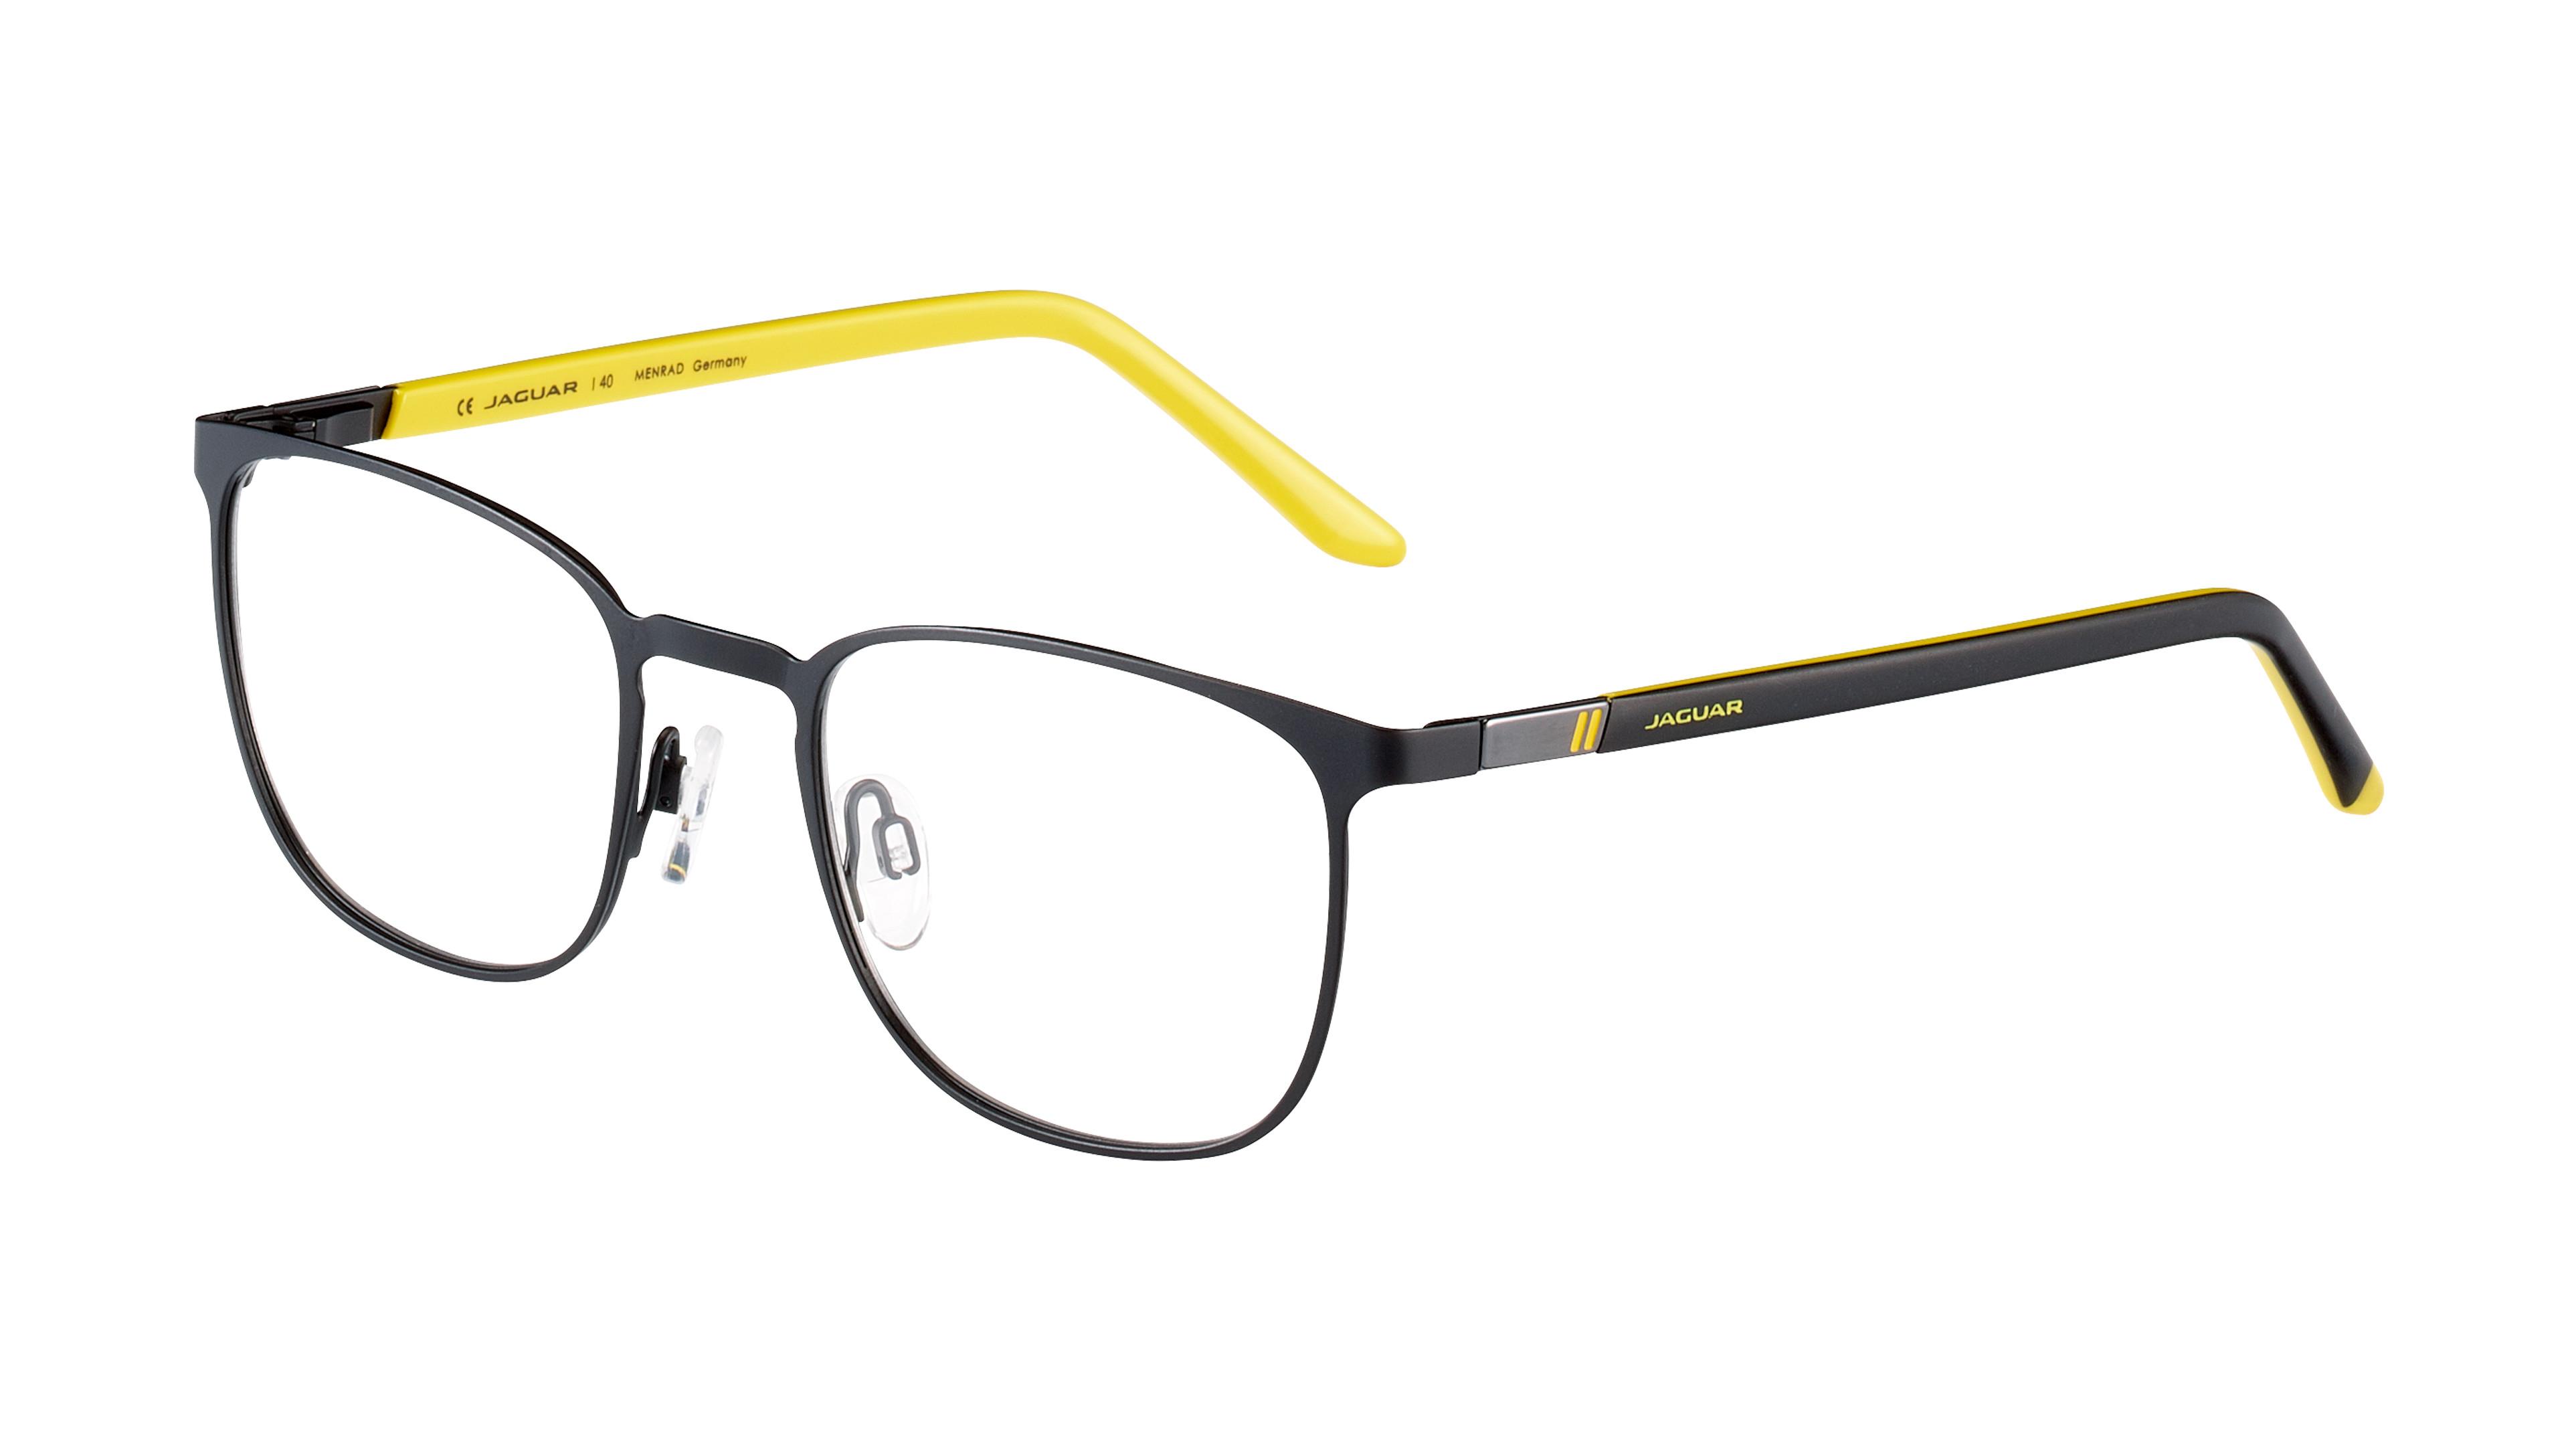 4051854293335-front-ex_angle-Jaguar-Brillenfassung-03-3600-6100